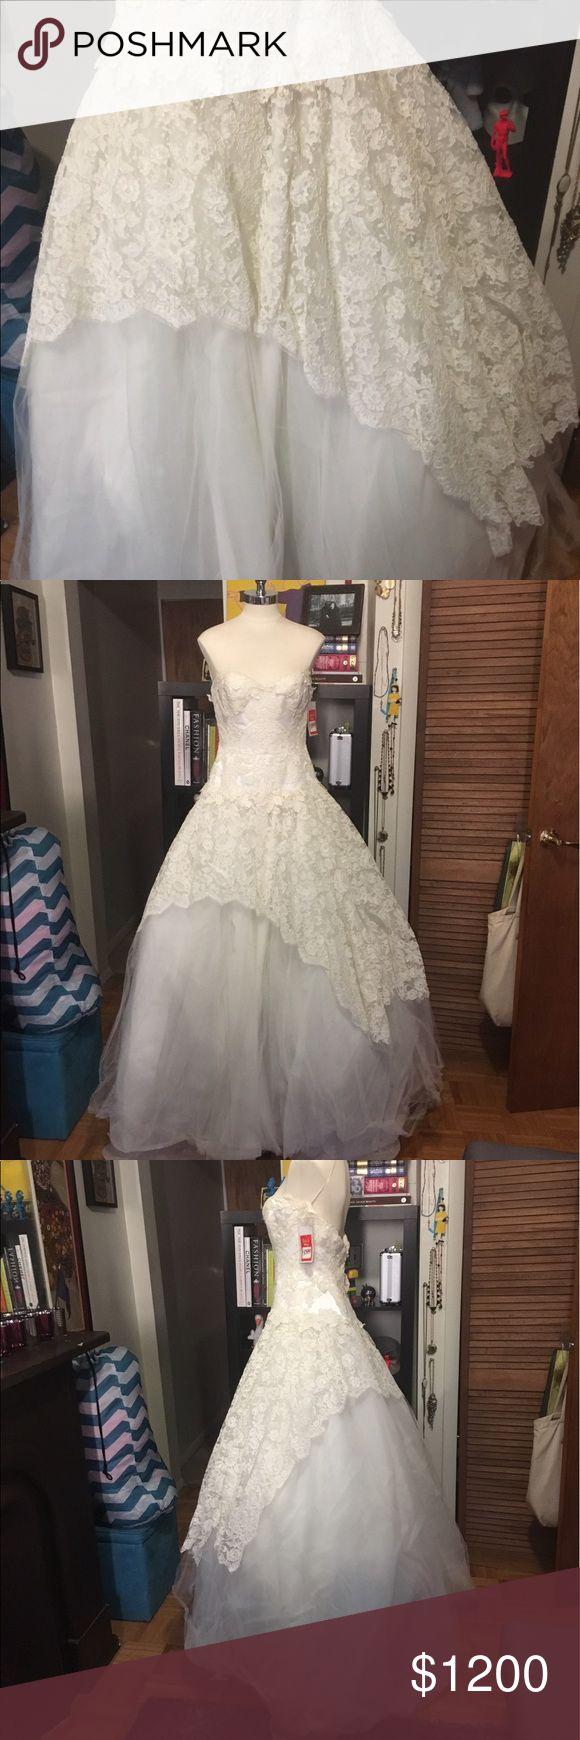 Edgardo Bonilla Wedding Dress Edgardo Bonilla wedding dress. Sample sale,in good but not great condition. Never worn, has a few tears in the lace. Tags still on! Edgardo Bonilla Dresses Wedding